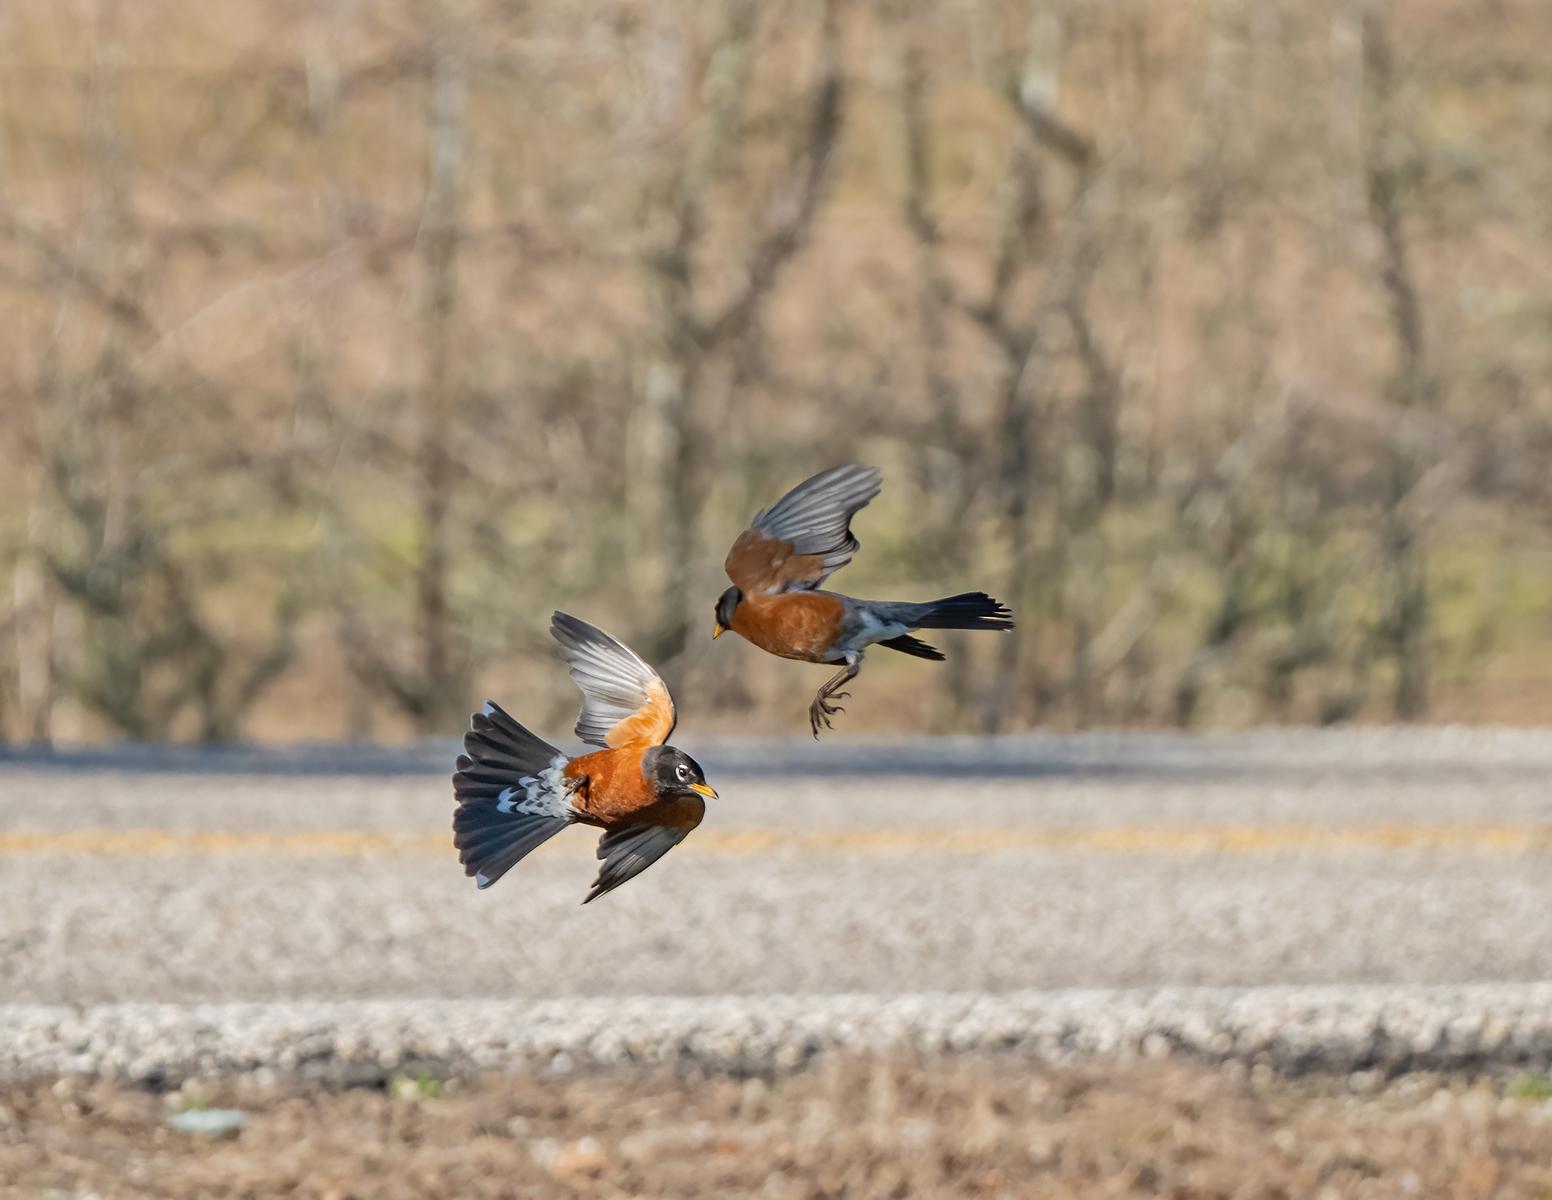 IMAGE: https://photos.smugmug.com/Private/n-XQ9MPw/Birds/Birds/i-5ZwdKxm/0/ebce589b/X3/American%20robin_9_2-22-21-33-X3.jpg